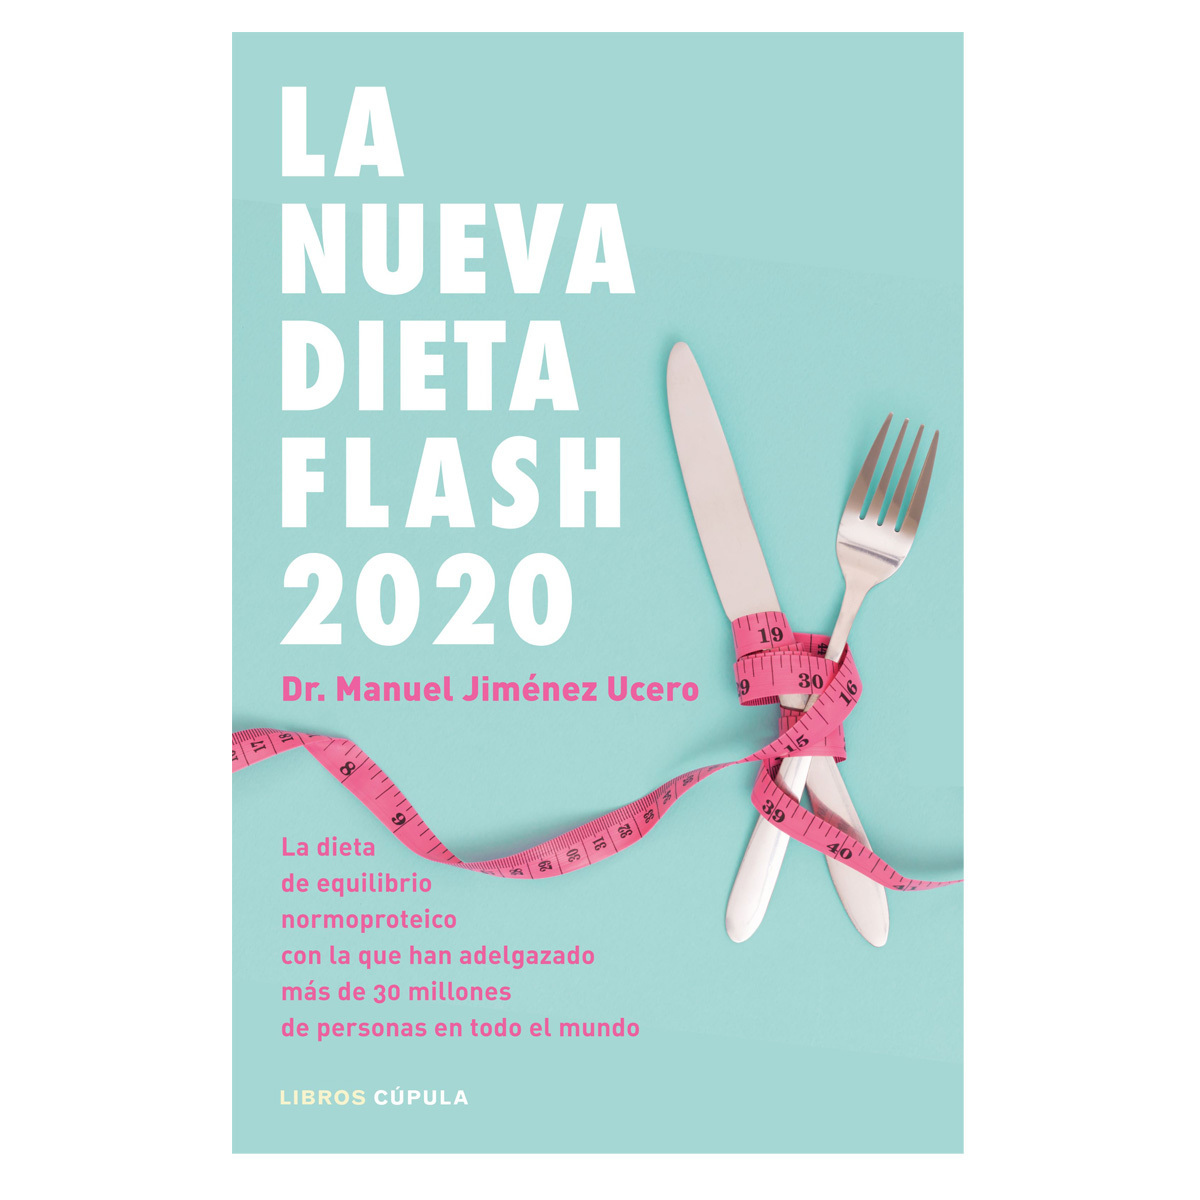 La nueva dieta flash 2020. Libros Cúpula. Dr. Manuel Jiménez Ucero.